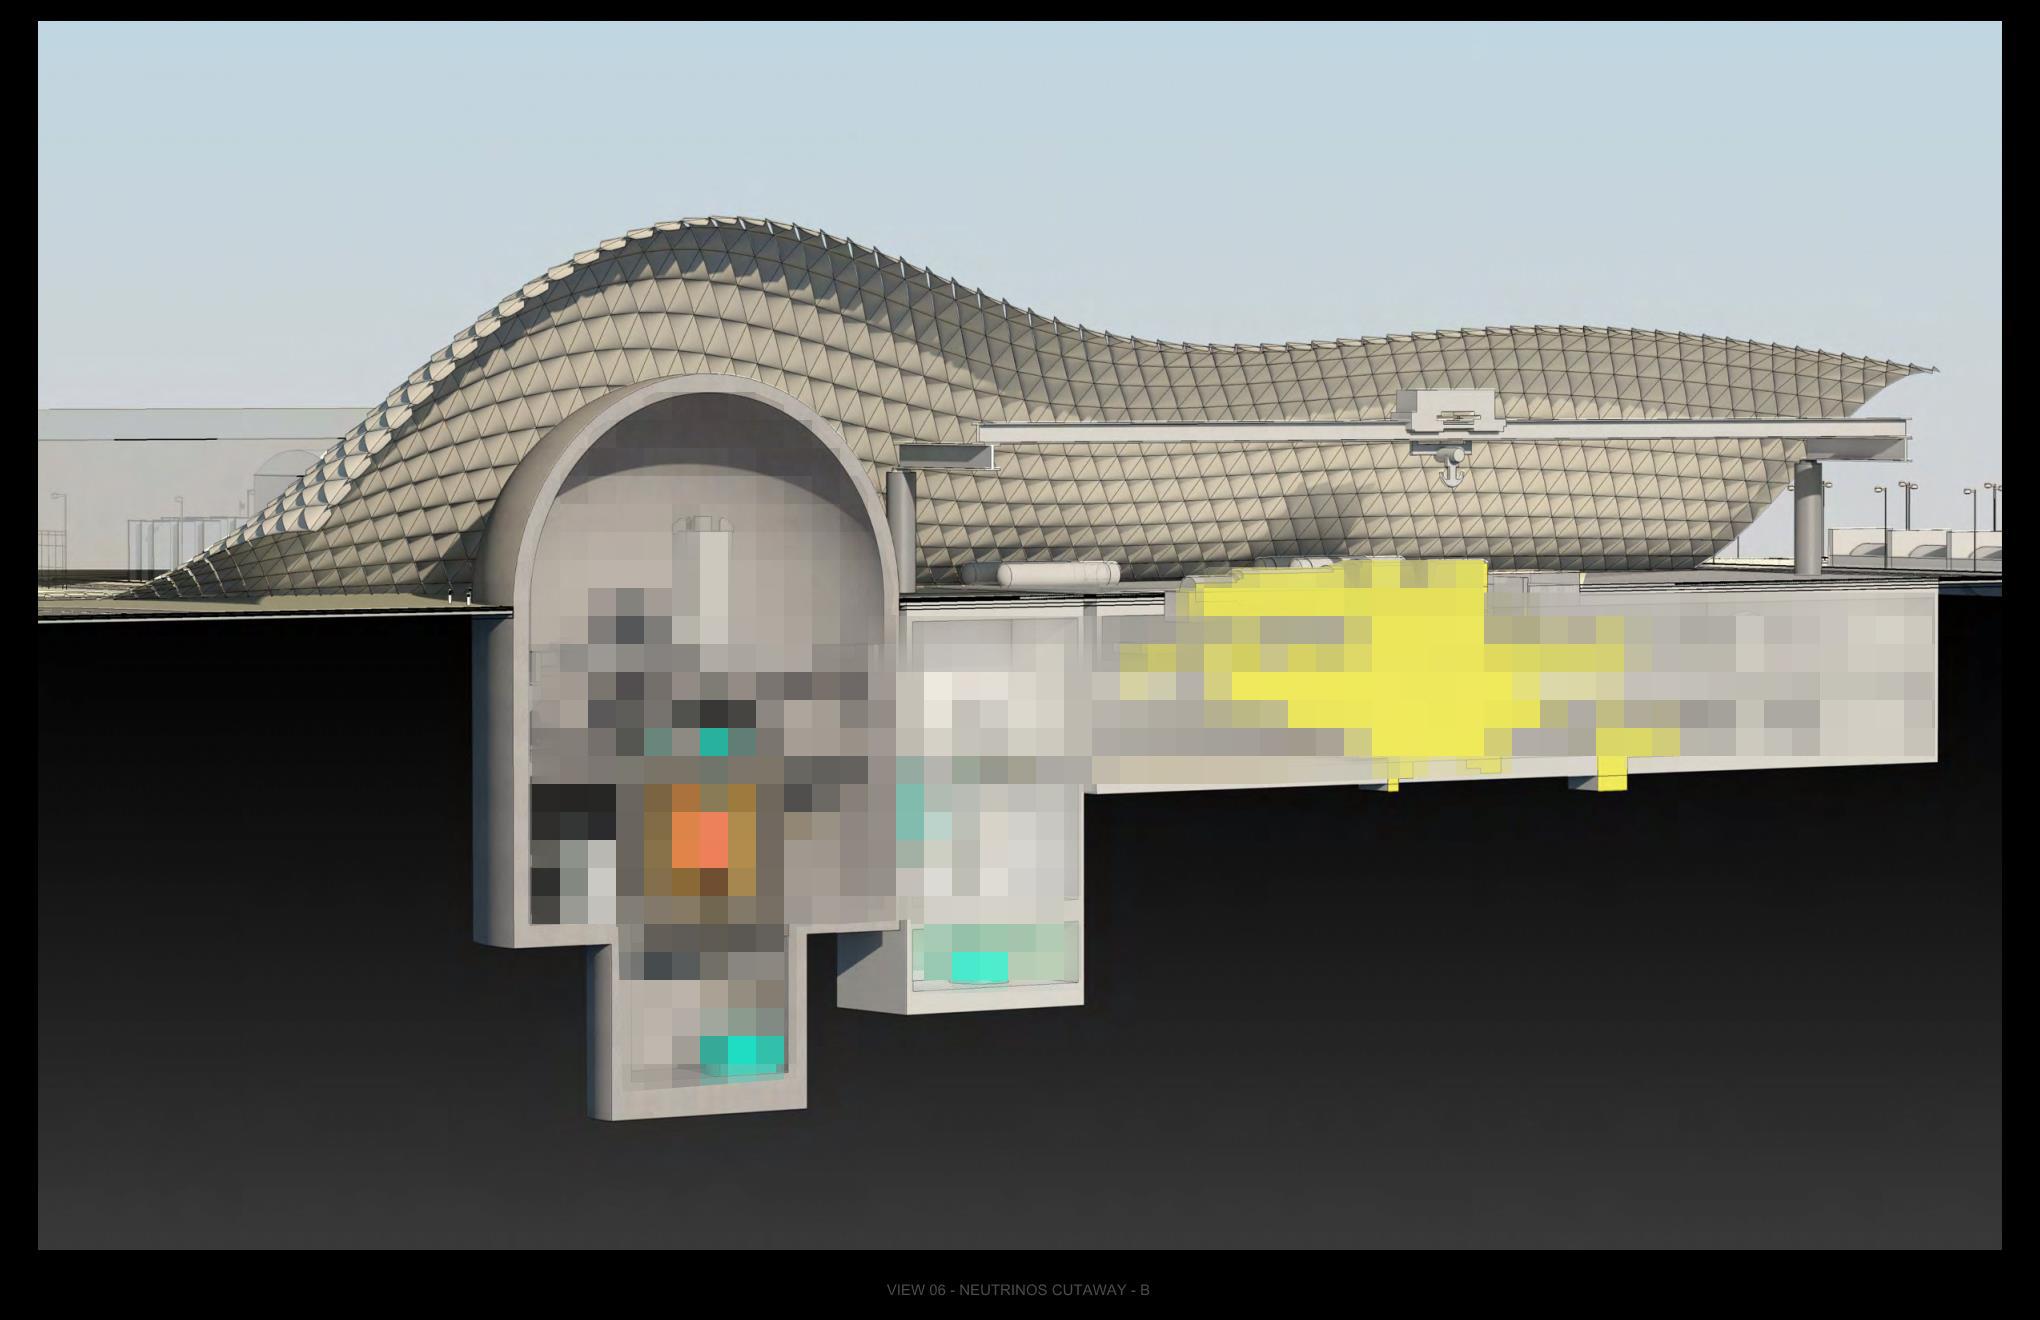 1501_Transatomic Power_J.Olinger Page 004_edit.jpg